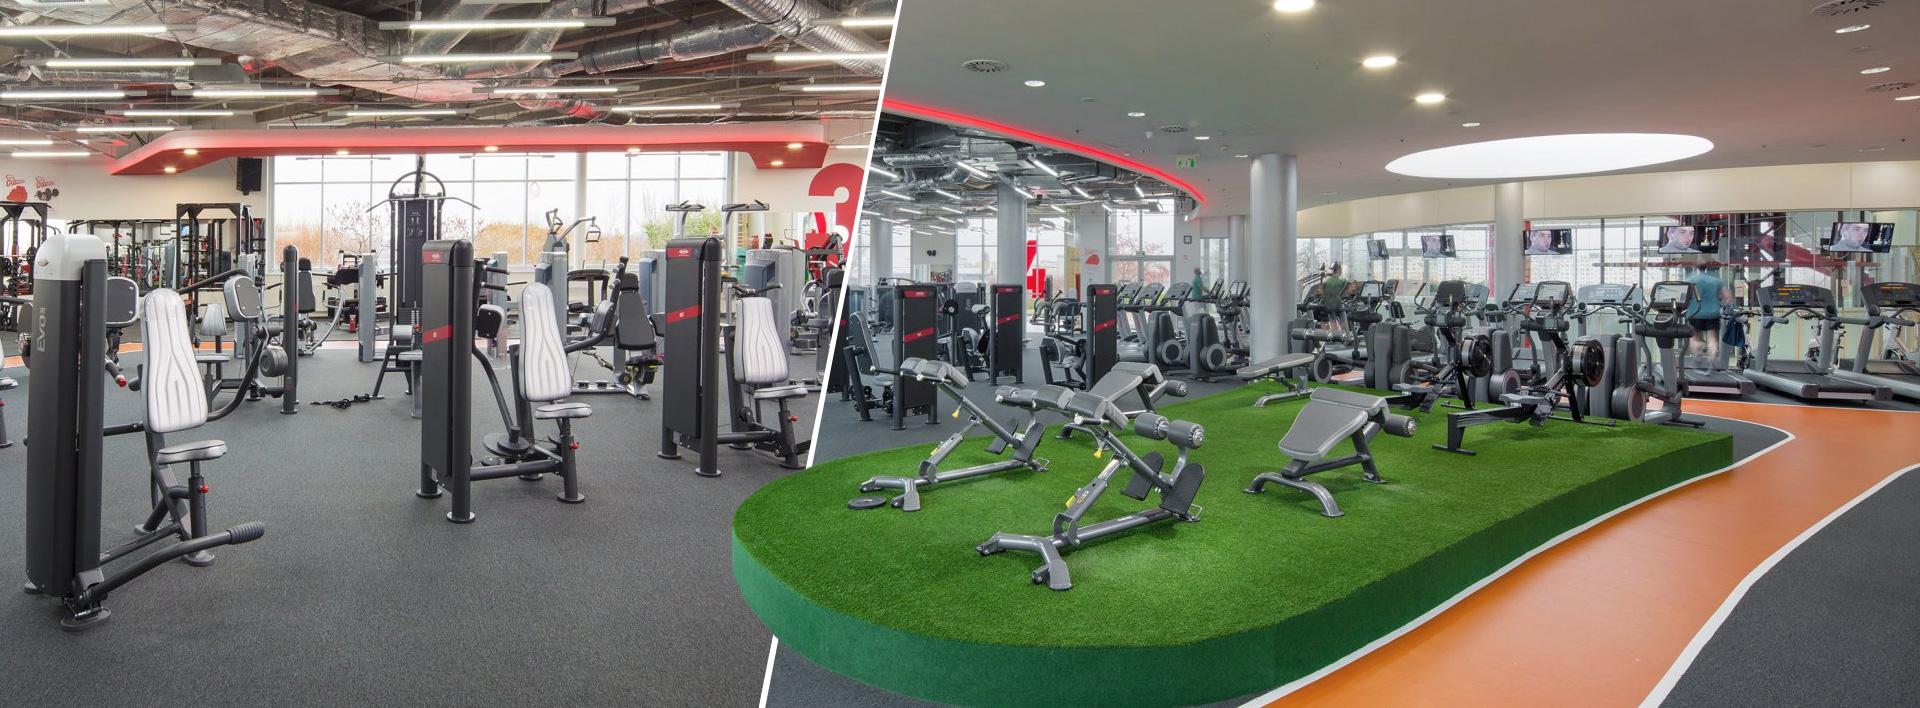 Victory Fitness Ázsia Center